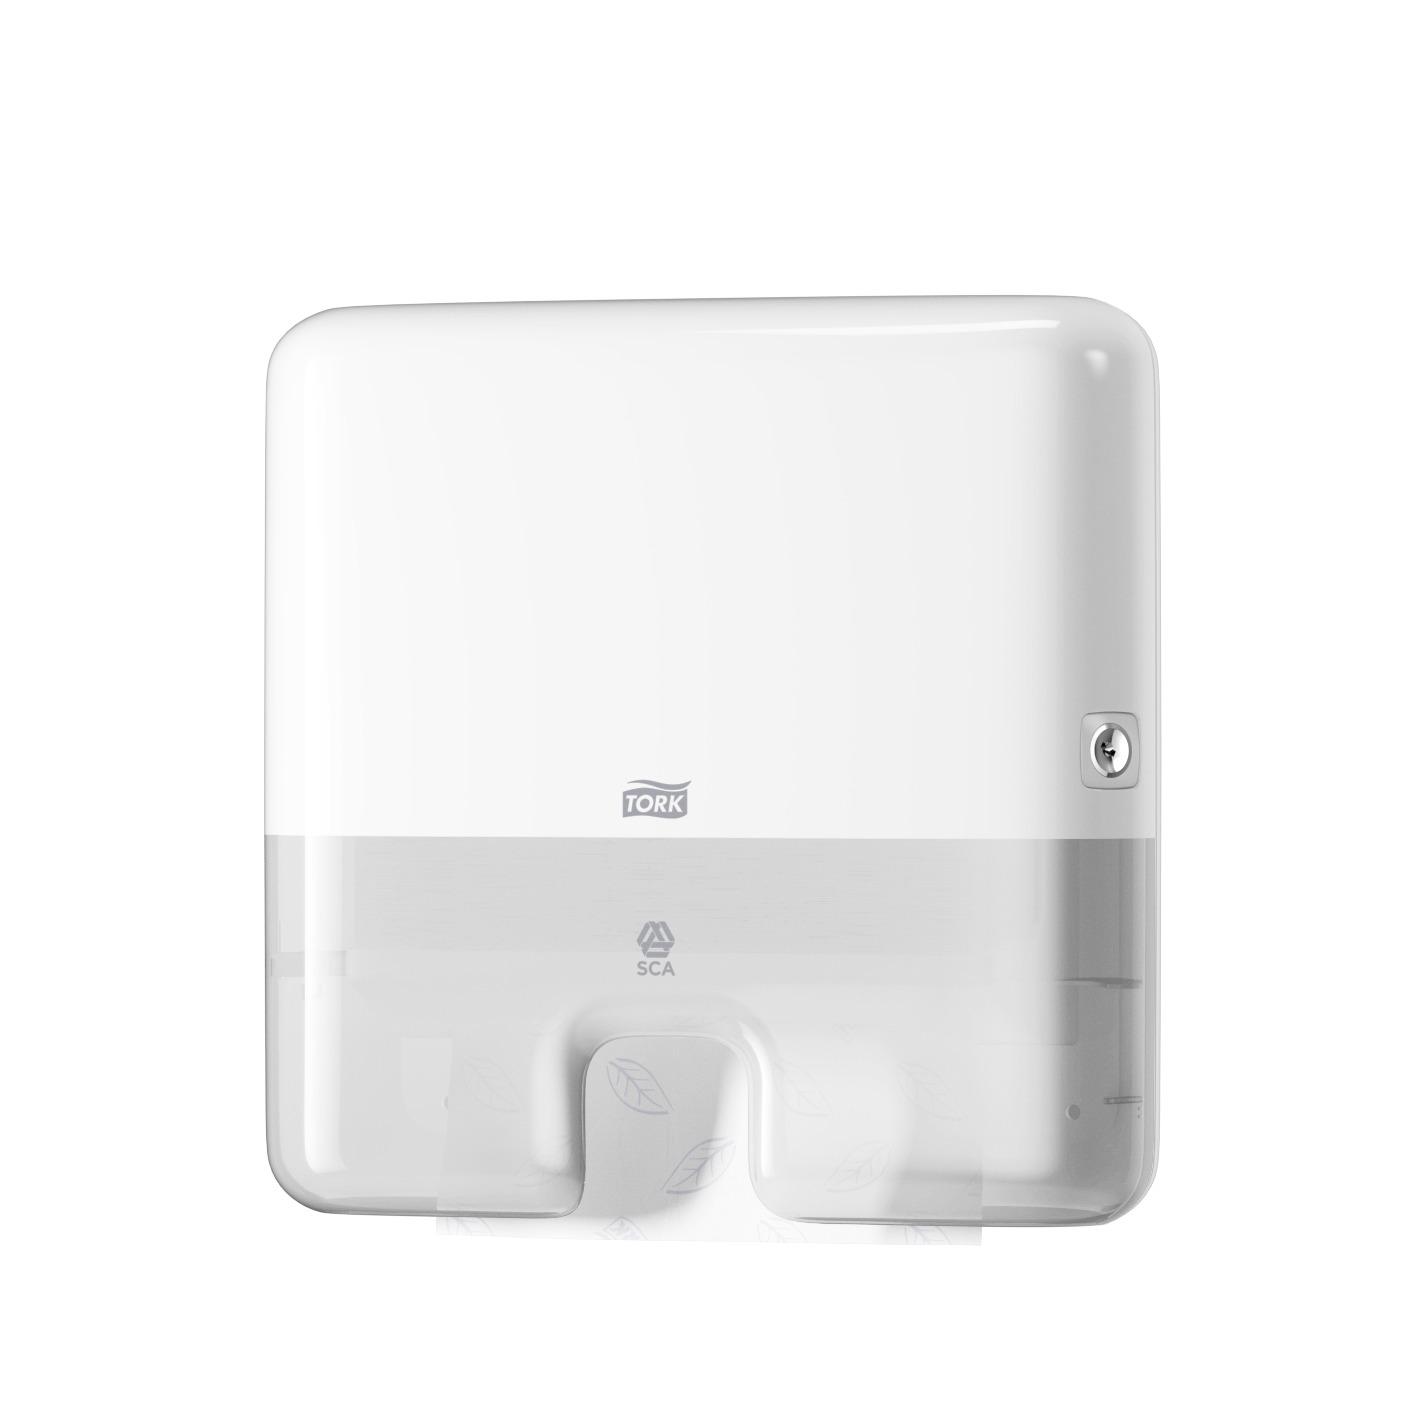 Tork Xpress Mini Spender Elevation, H2 - Interfold System, Kunststoff, weiß, 30 x 29,5 x 10 cm